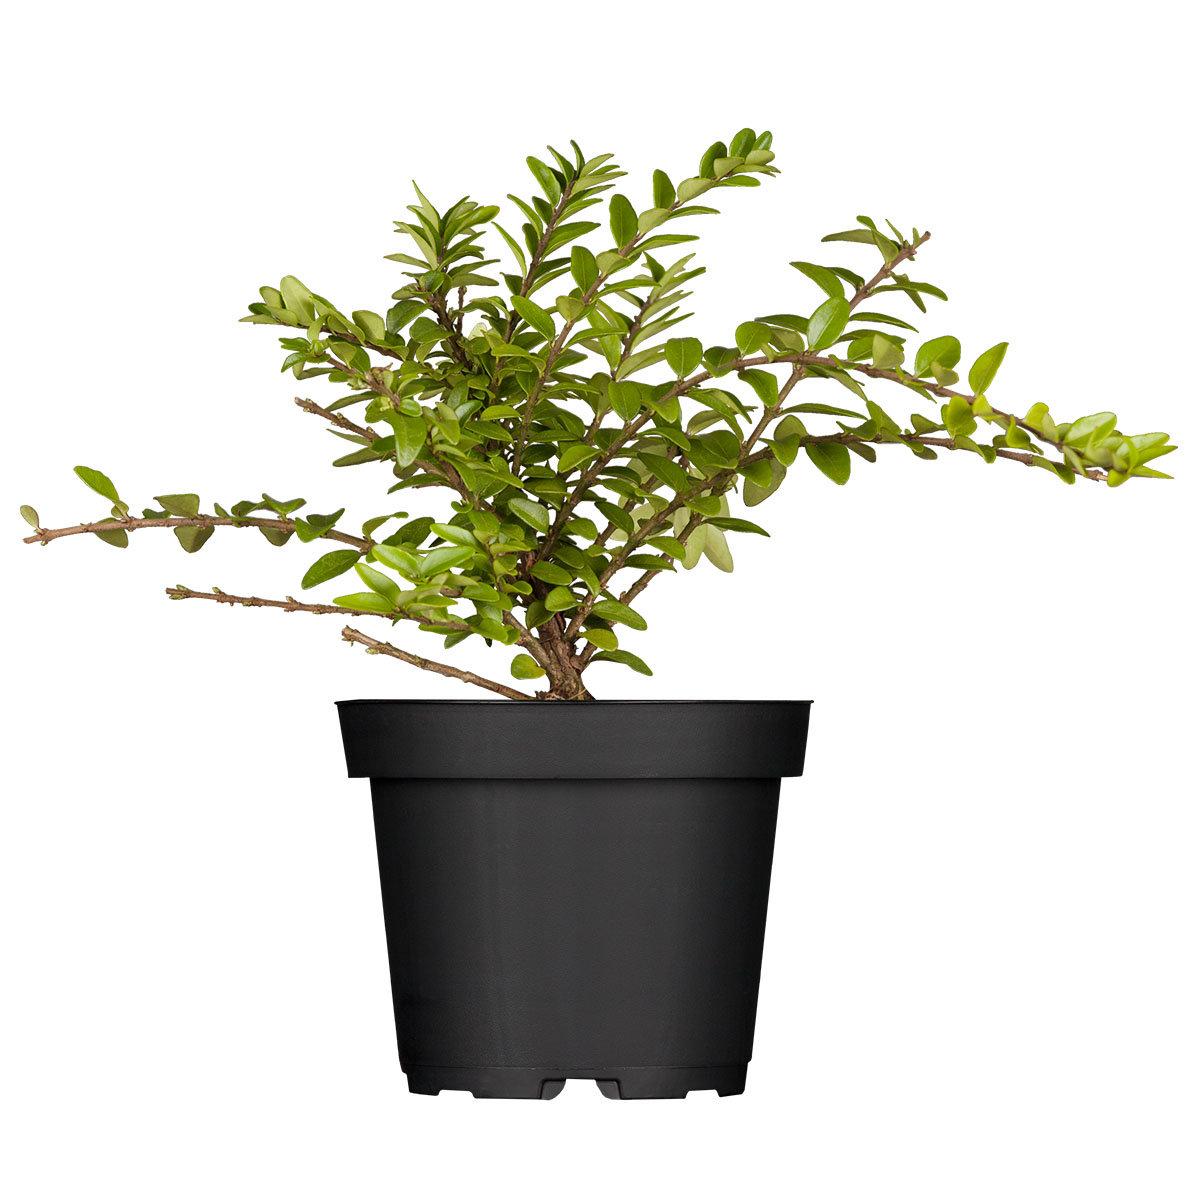 Heckenmyrte Maigrün, im ca. 9 cm-Topf | #4